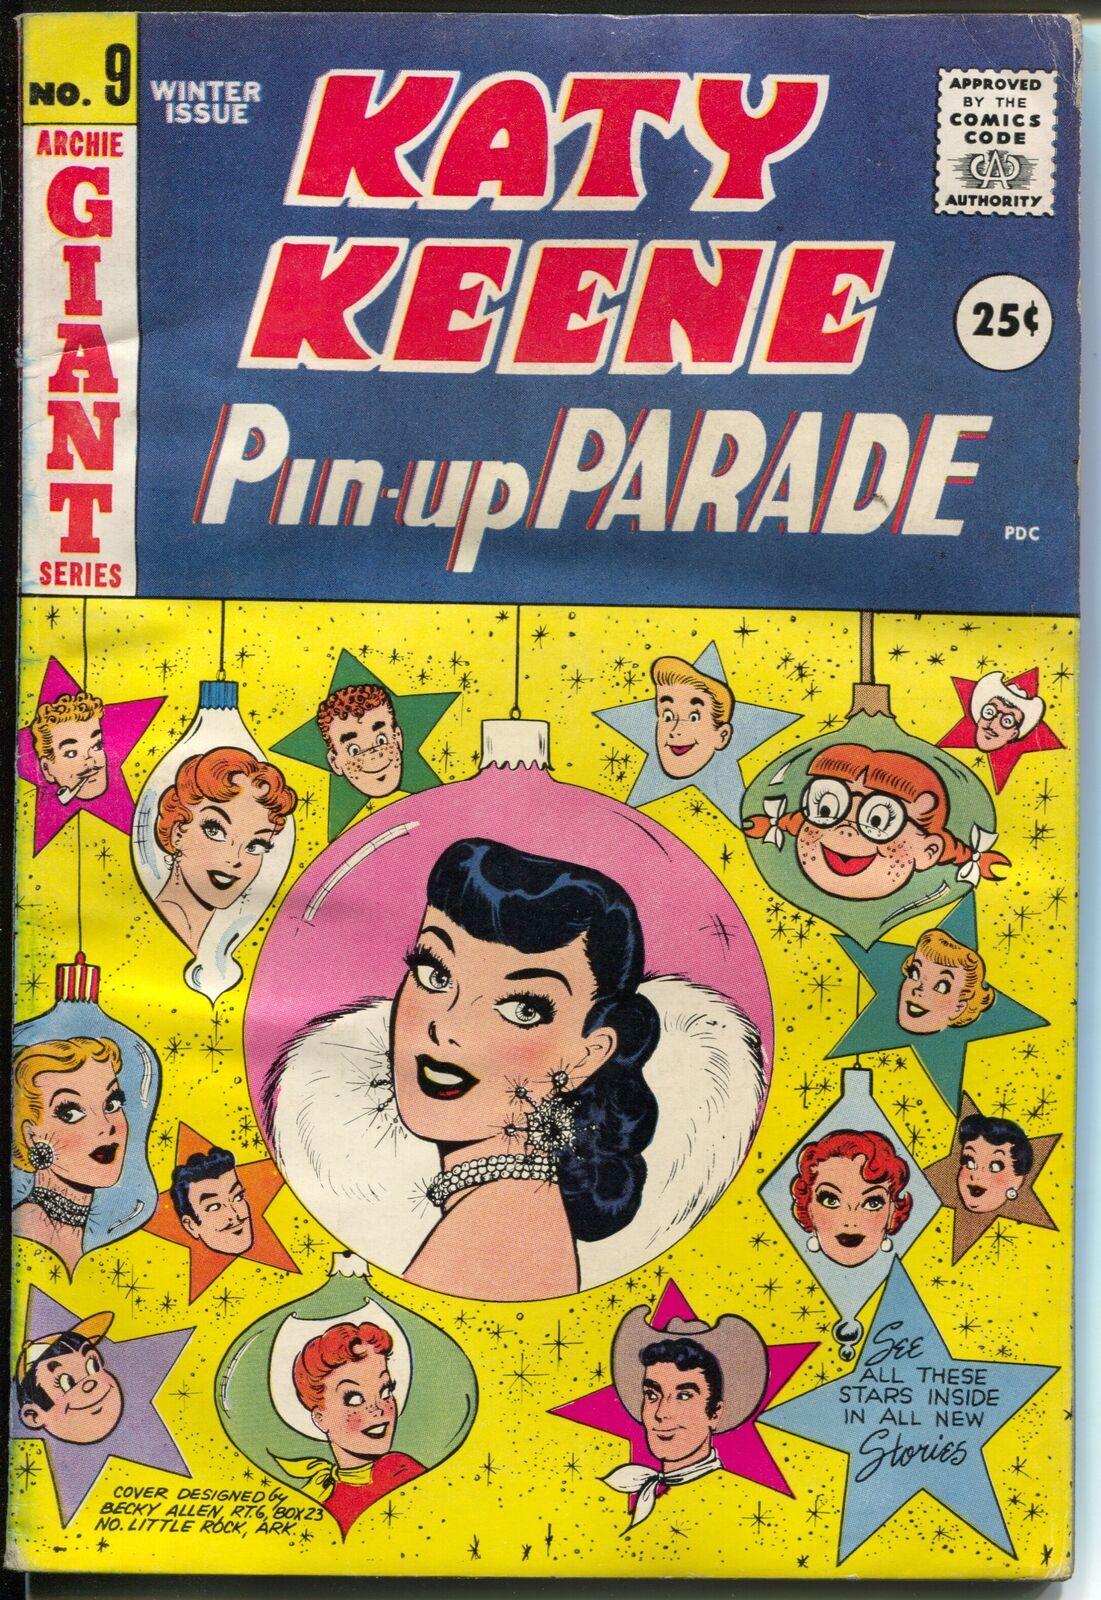 Katy Keene Pin Up Parade 20 120520 Bill Woggon fashions pin ups paper  dolls VG    Comic Books   Silver Age, Archie Comics, Katy Keene